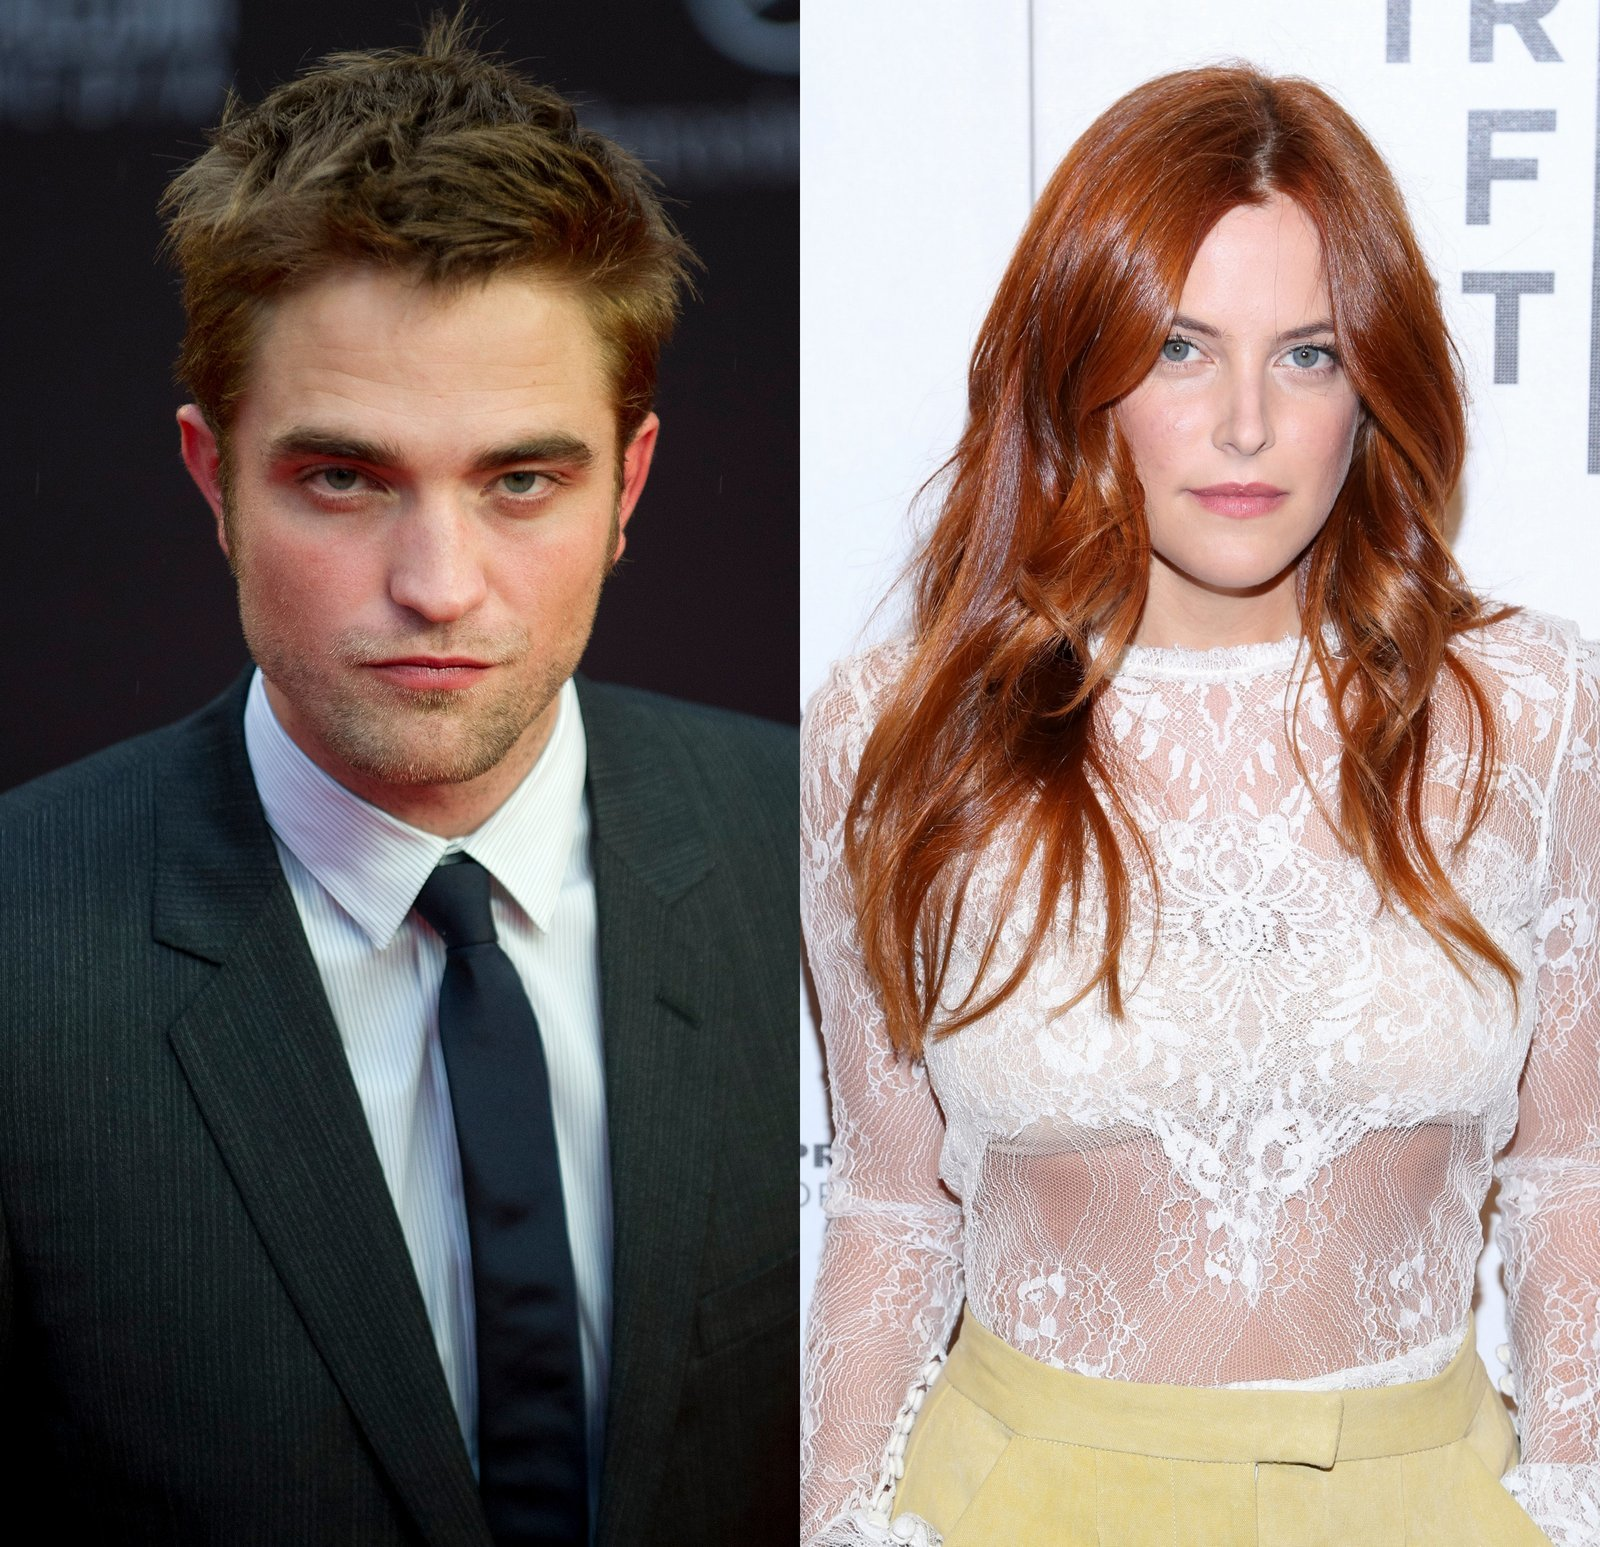 Robert Pattinson and Riley Keough